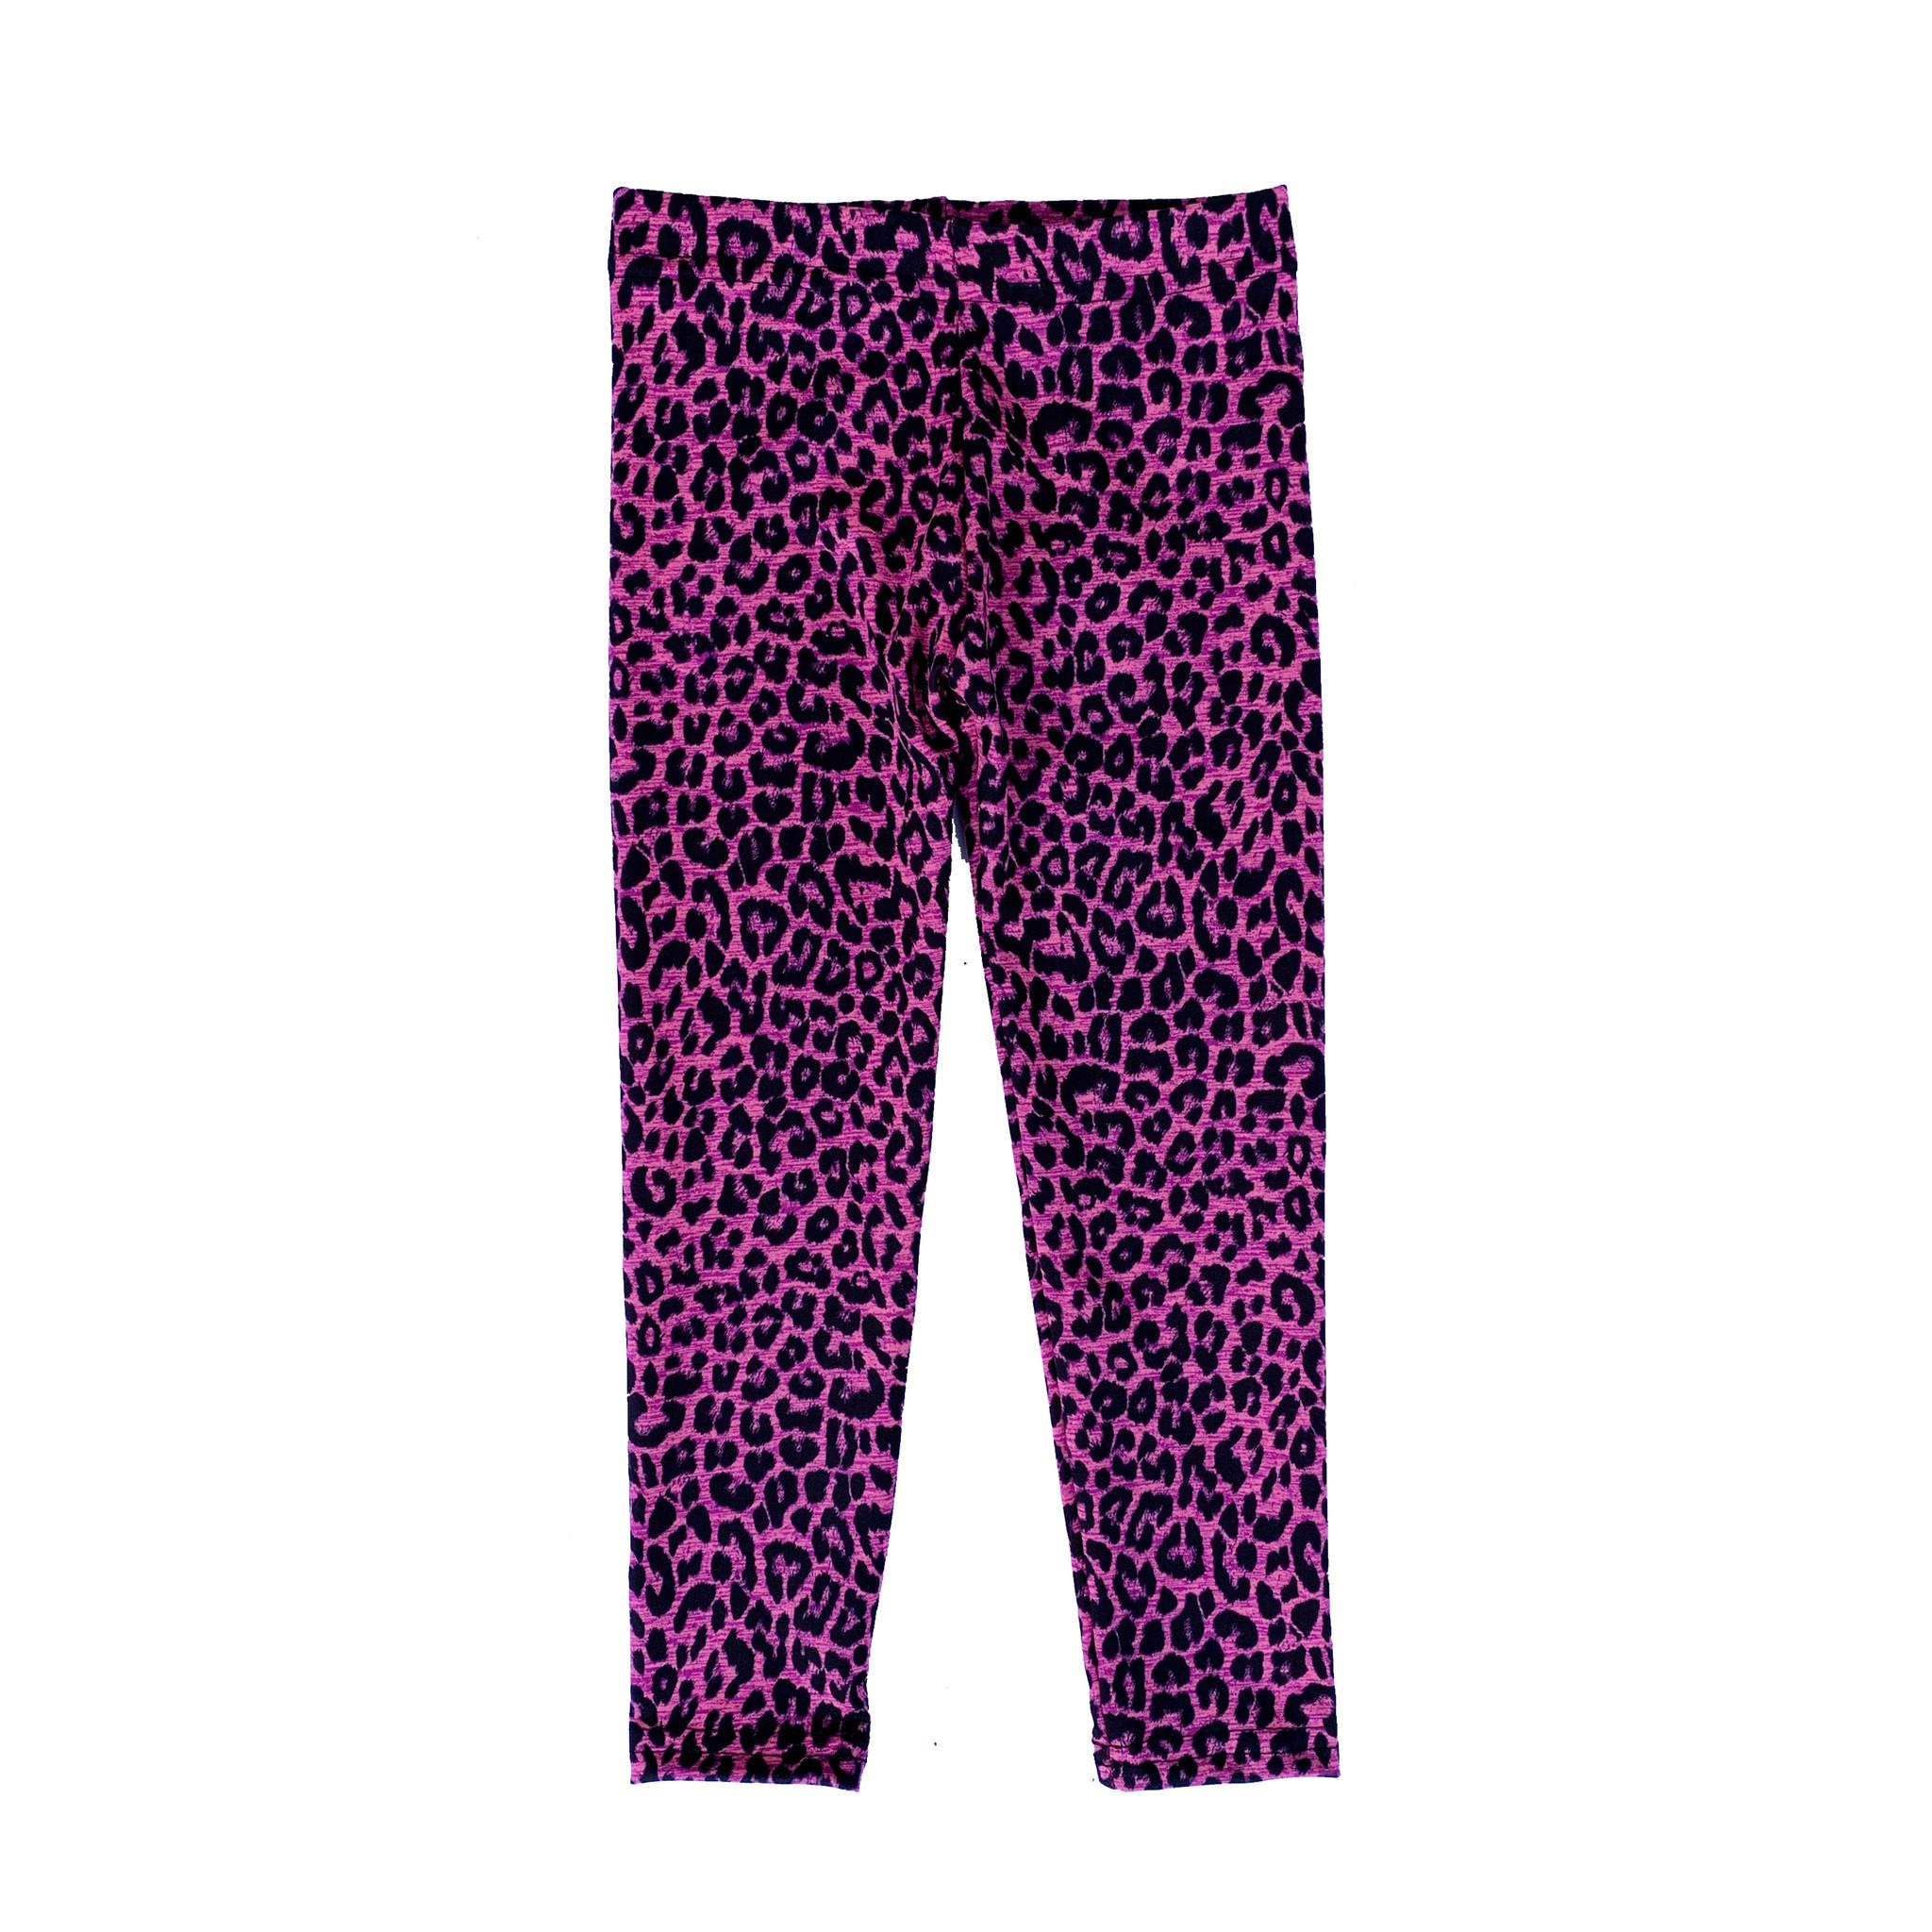 Dori Creations Pink Leopard Heathered Legging